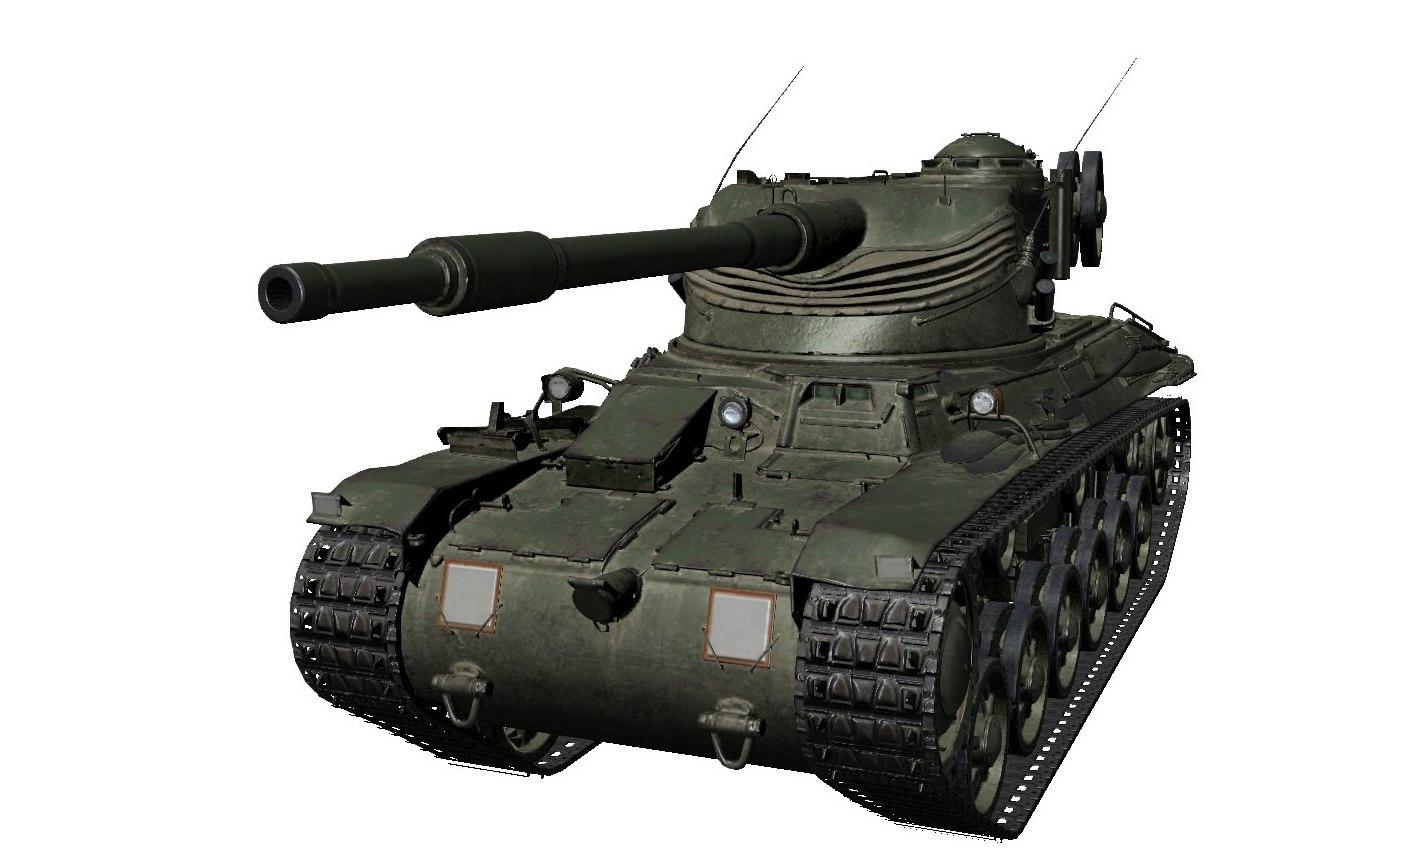 Особенности танка Strv m/42-57 Alt A.2